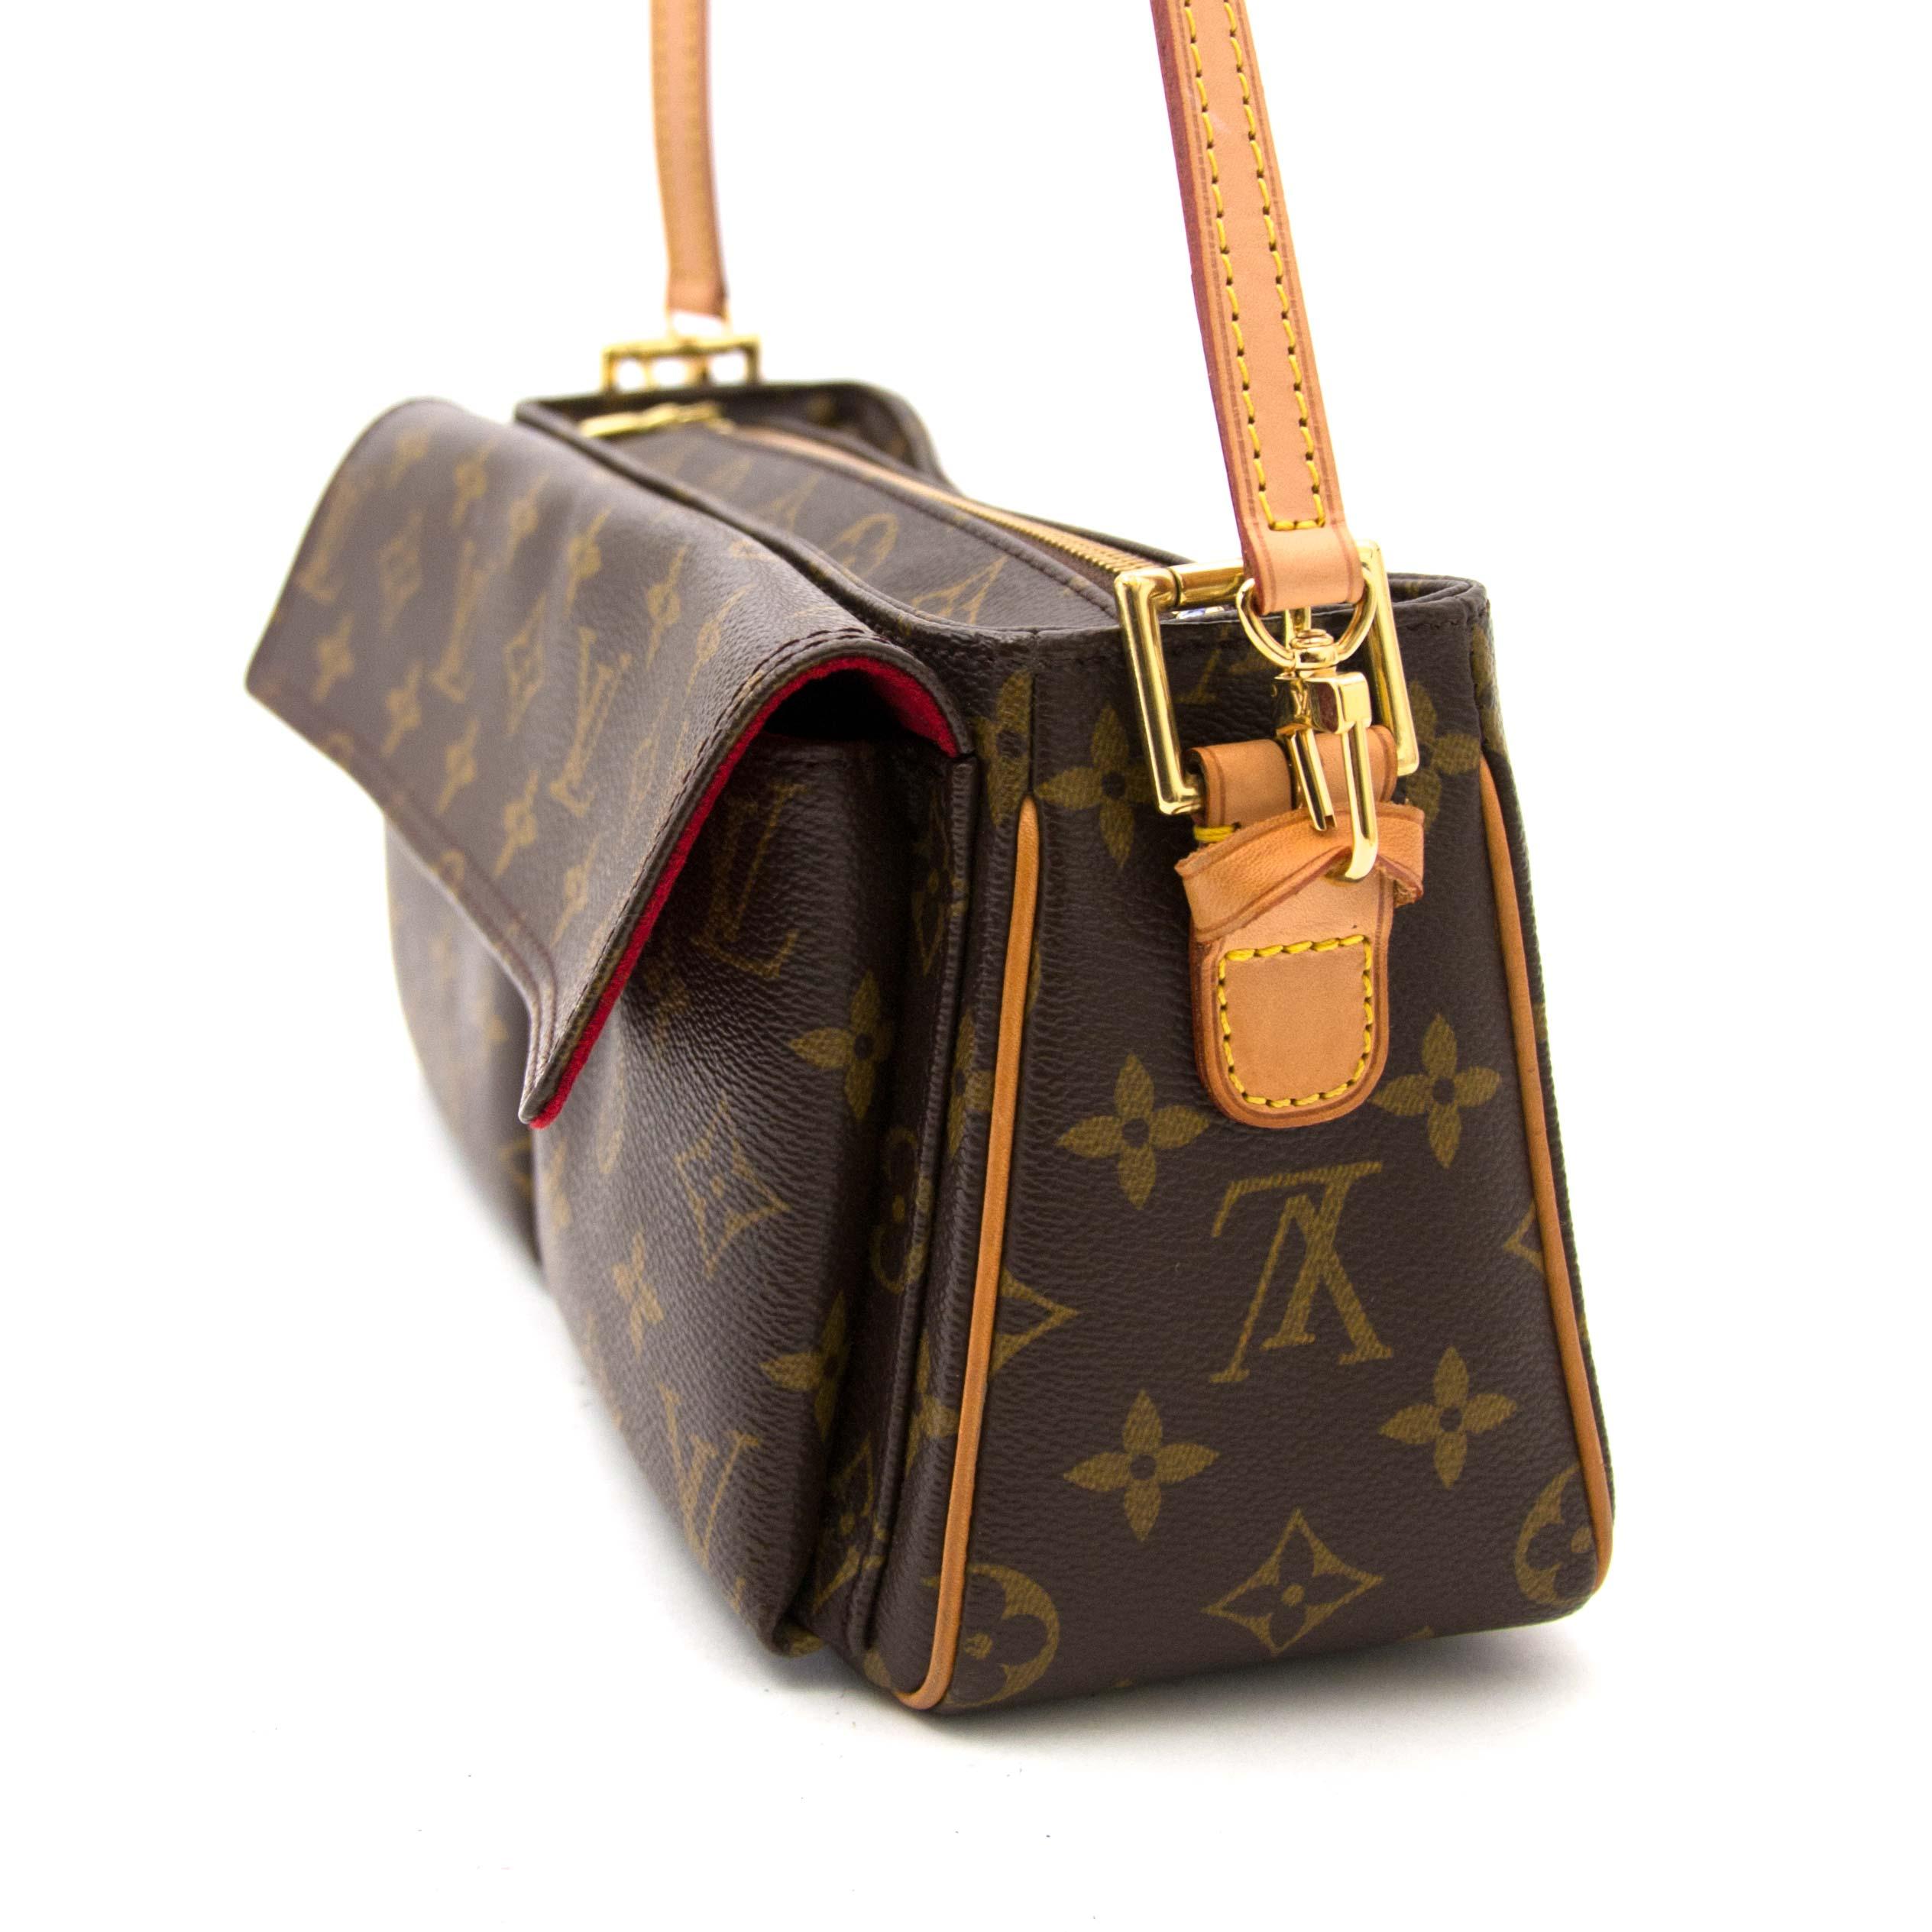 fb94137381 ... looking for a secondhand Louis Vuitton Monogram Canvas Viva Cite MM Bag